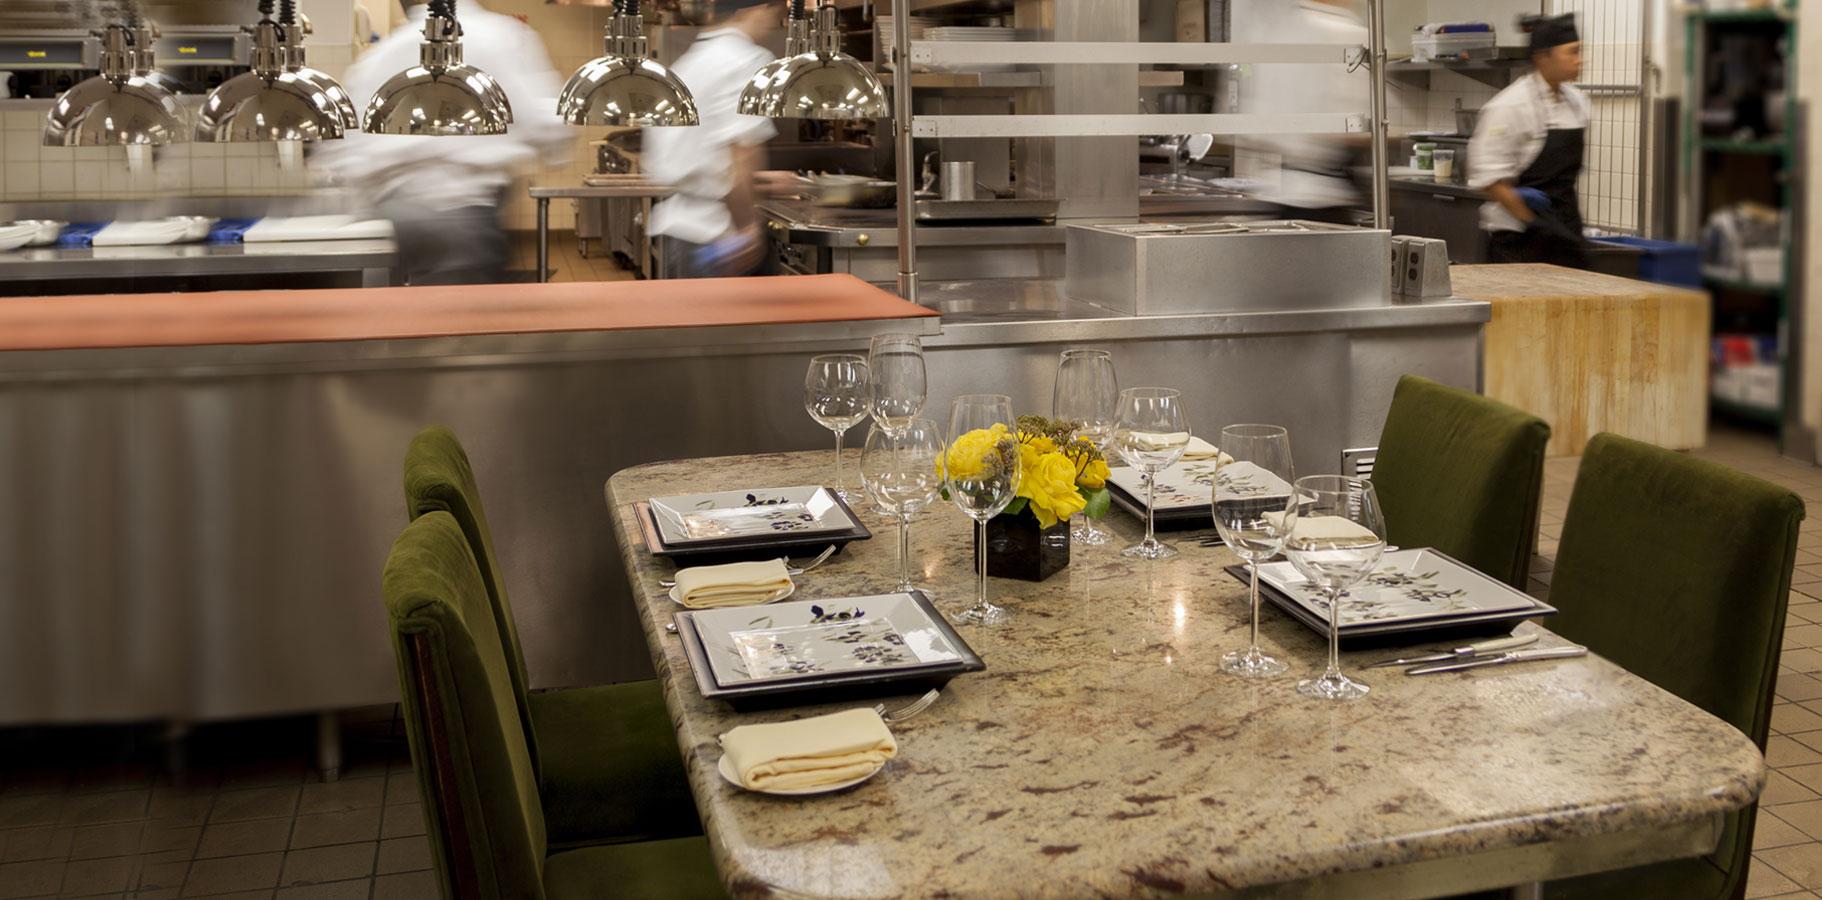 Restaurant Kitchen Table chef's table in philadelphia